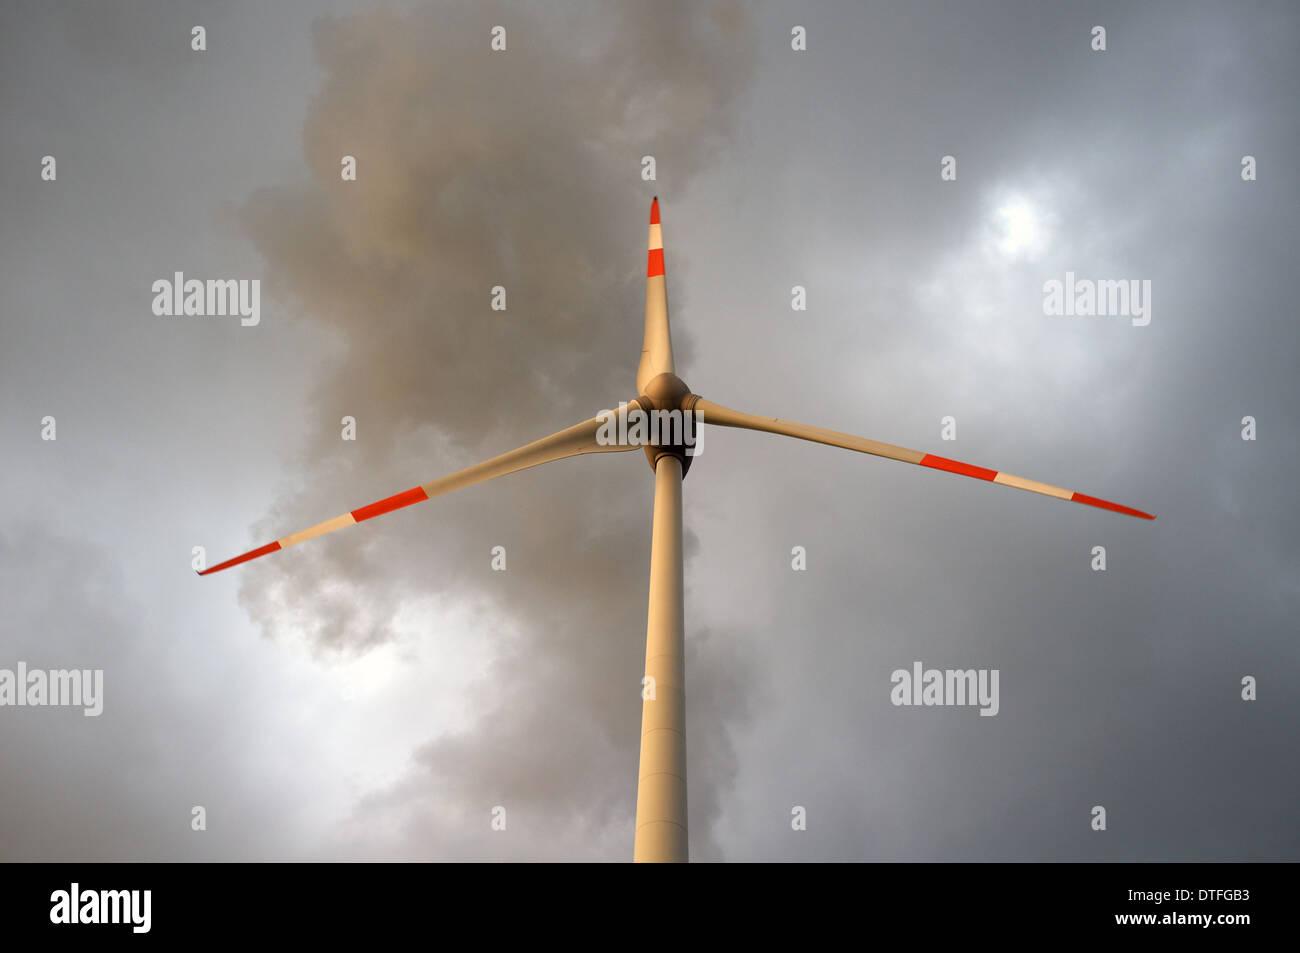 Wind turbine Gelsenkirchen-Scholven, Germany. - Stock Image